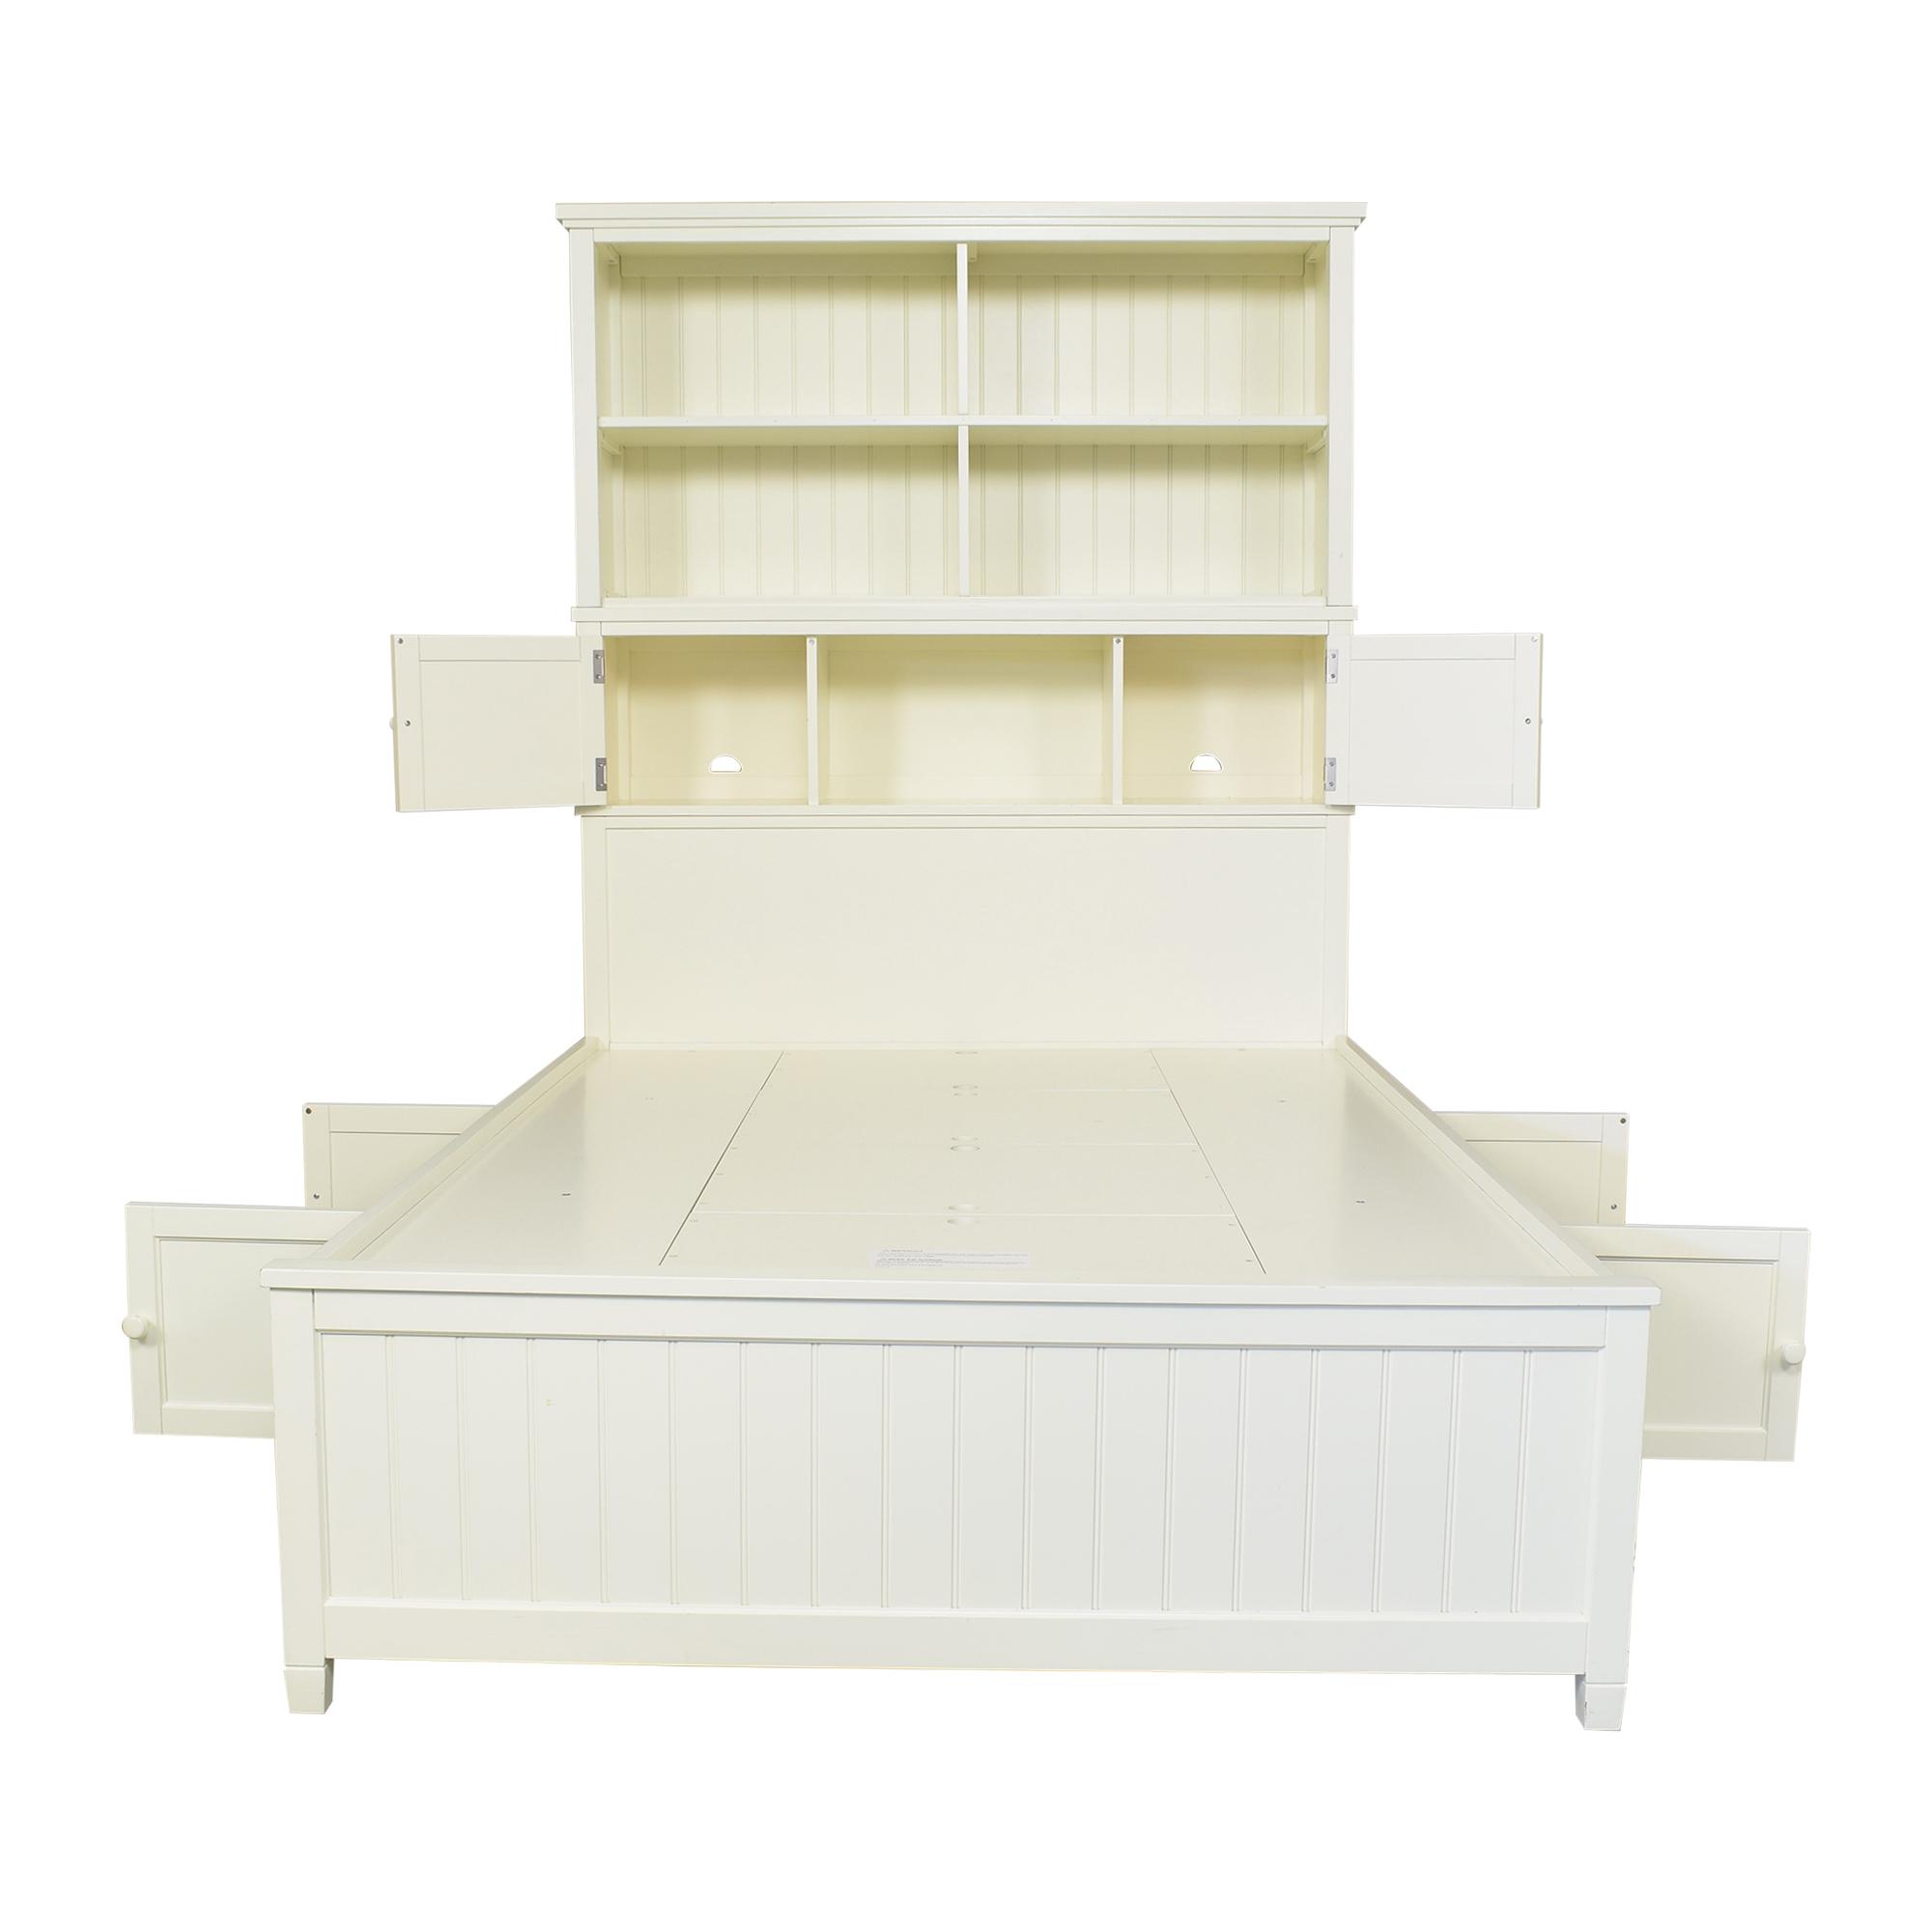 Pottery Barn Teen Pottery Barn Teen Beadboard Storage Full Bed for sale